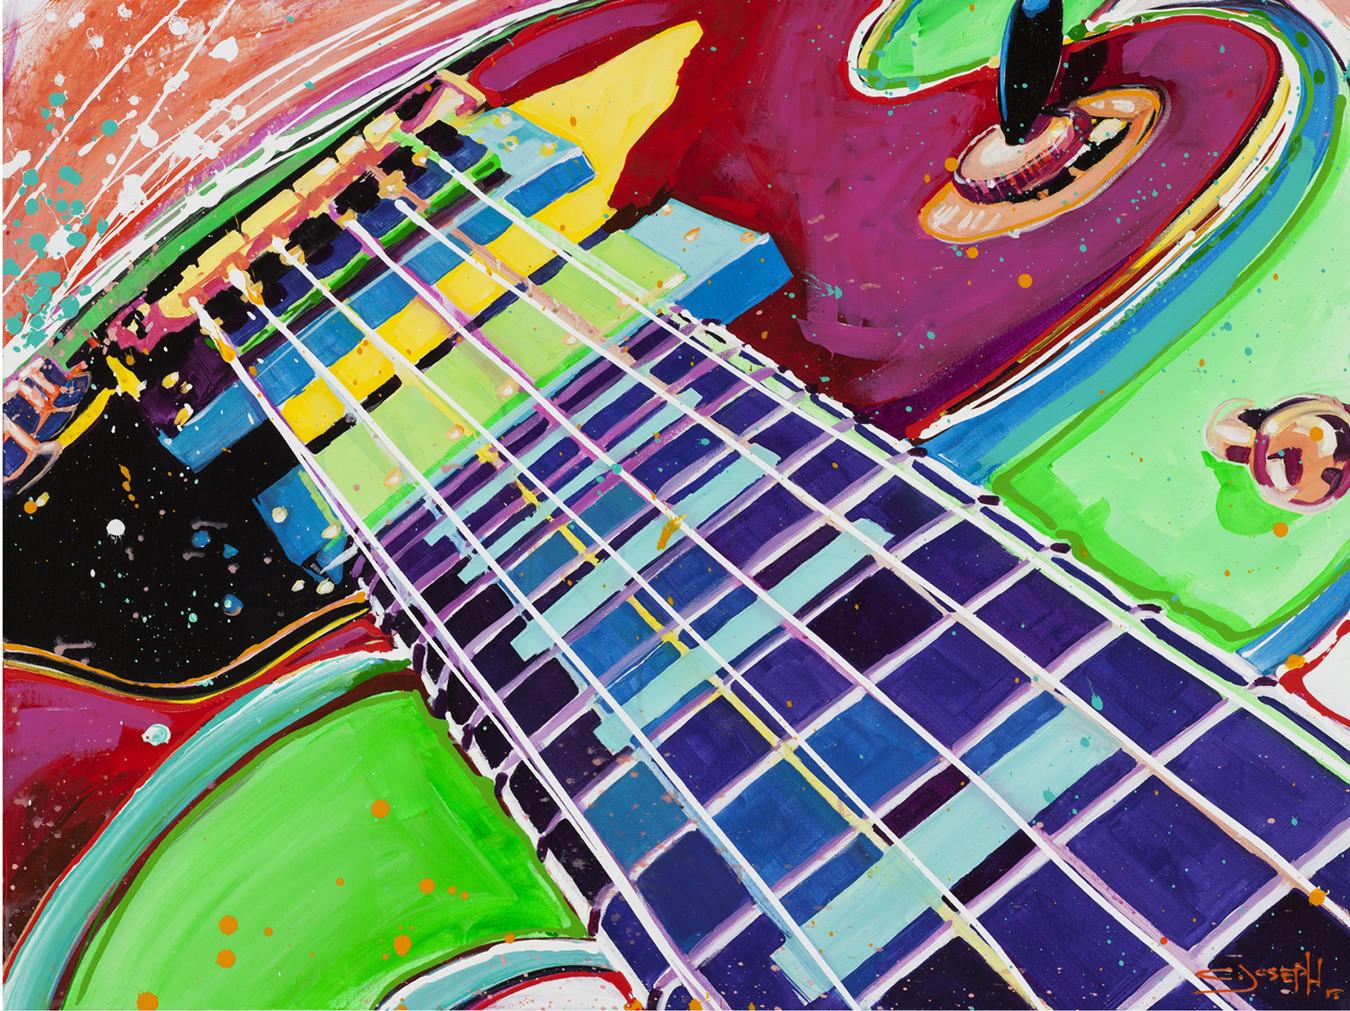 Chris_gonzalez_guitar_pzosgf